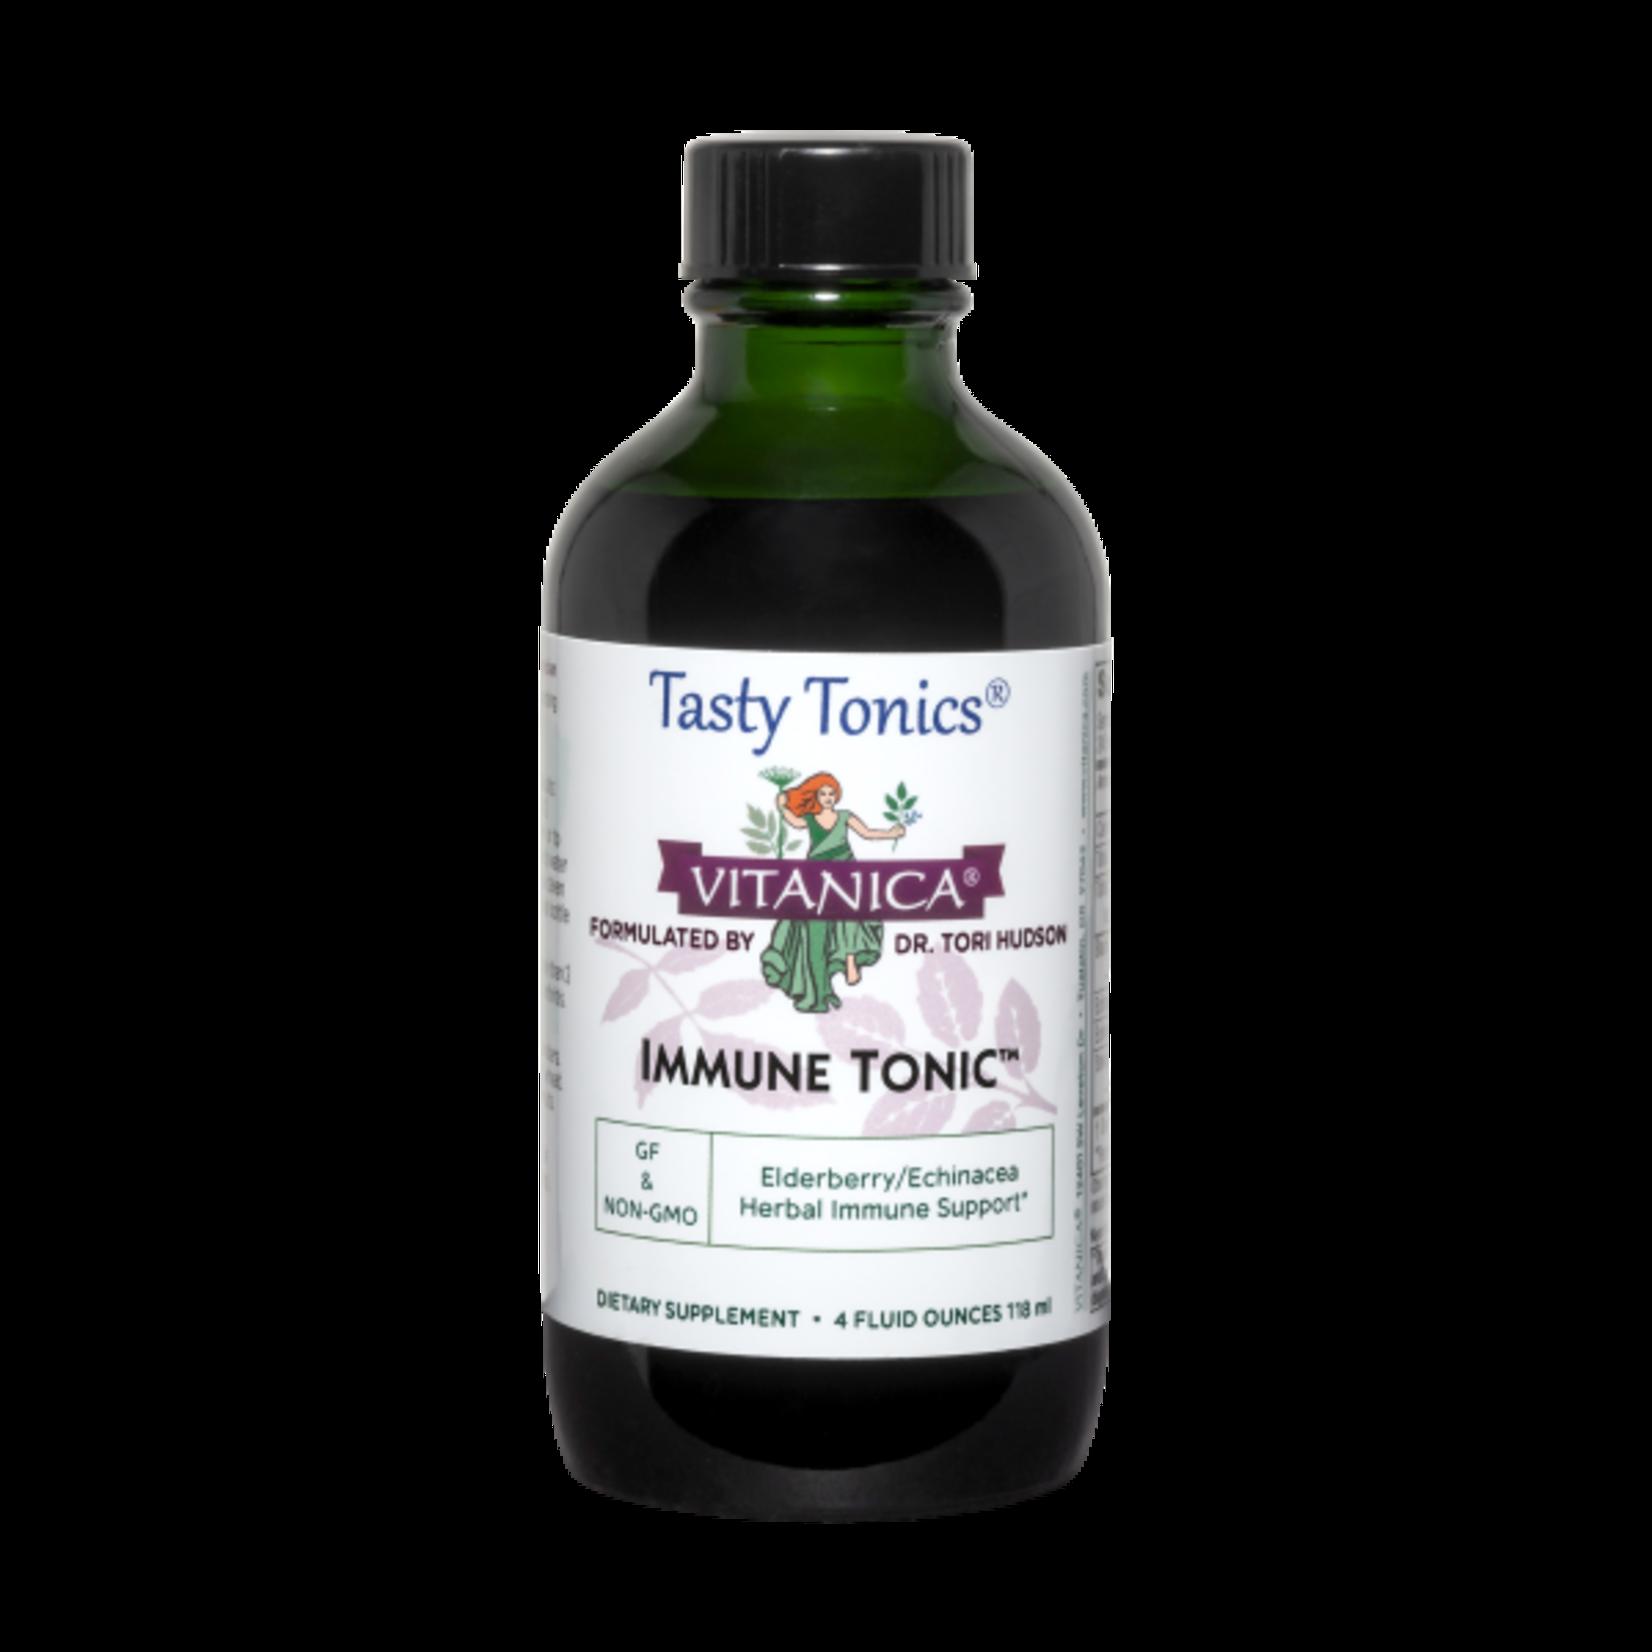 Vitanica Immune Tonic 4oz Elderberry / Echinacea